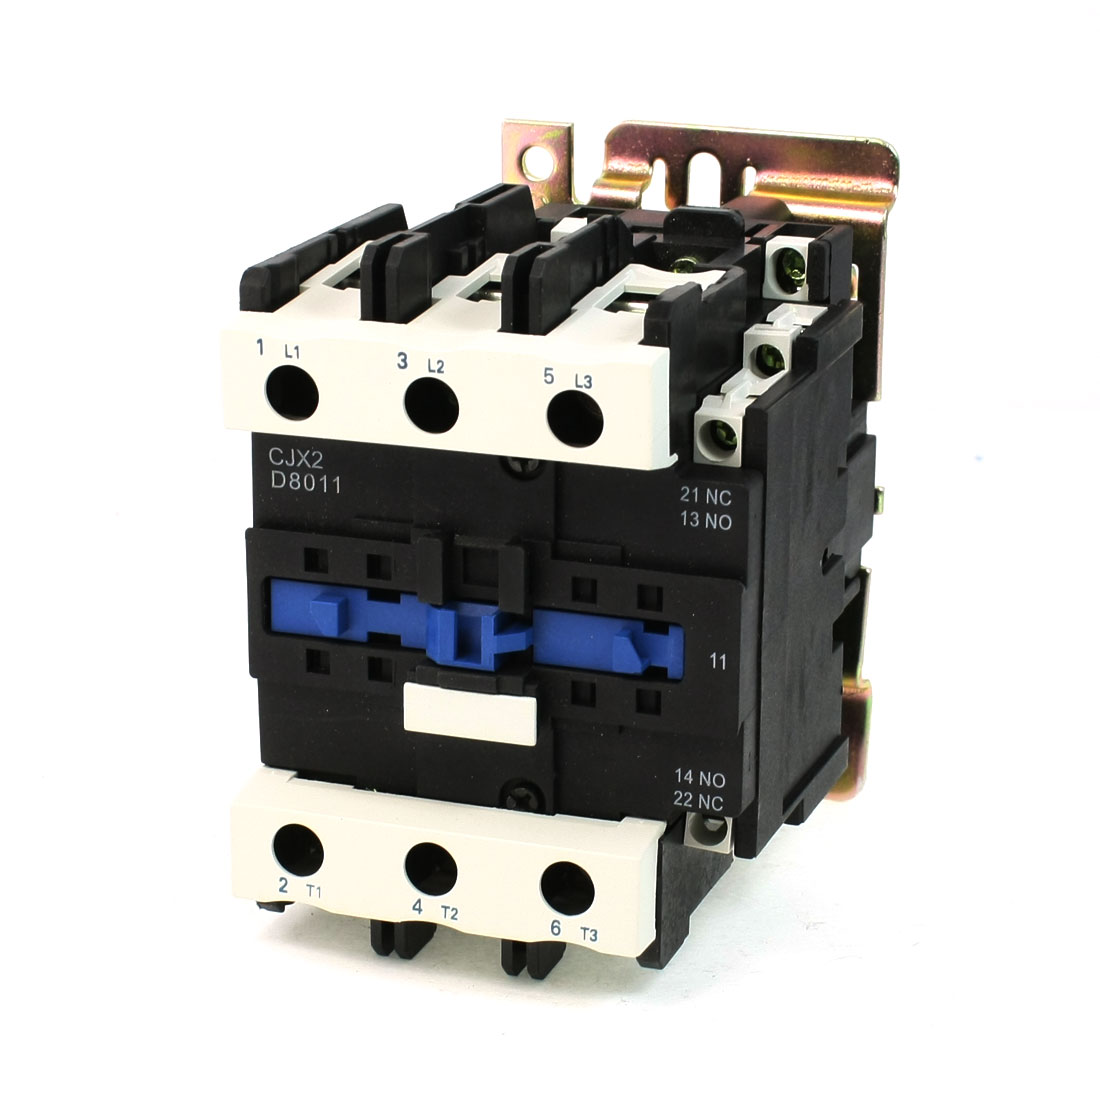 CJX2-9511 AC Contactor 125A 3 Phase 3-Pole NO 220V 50/60Hz Coil